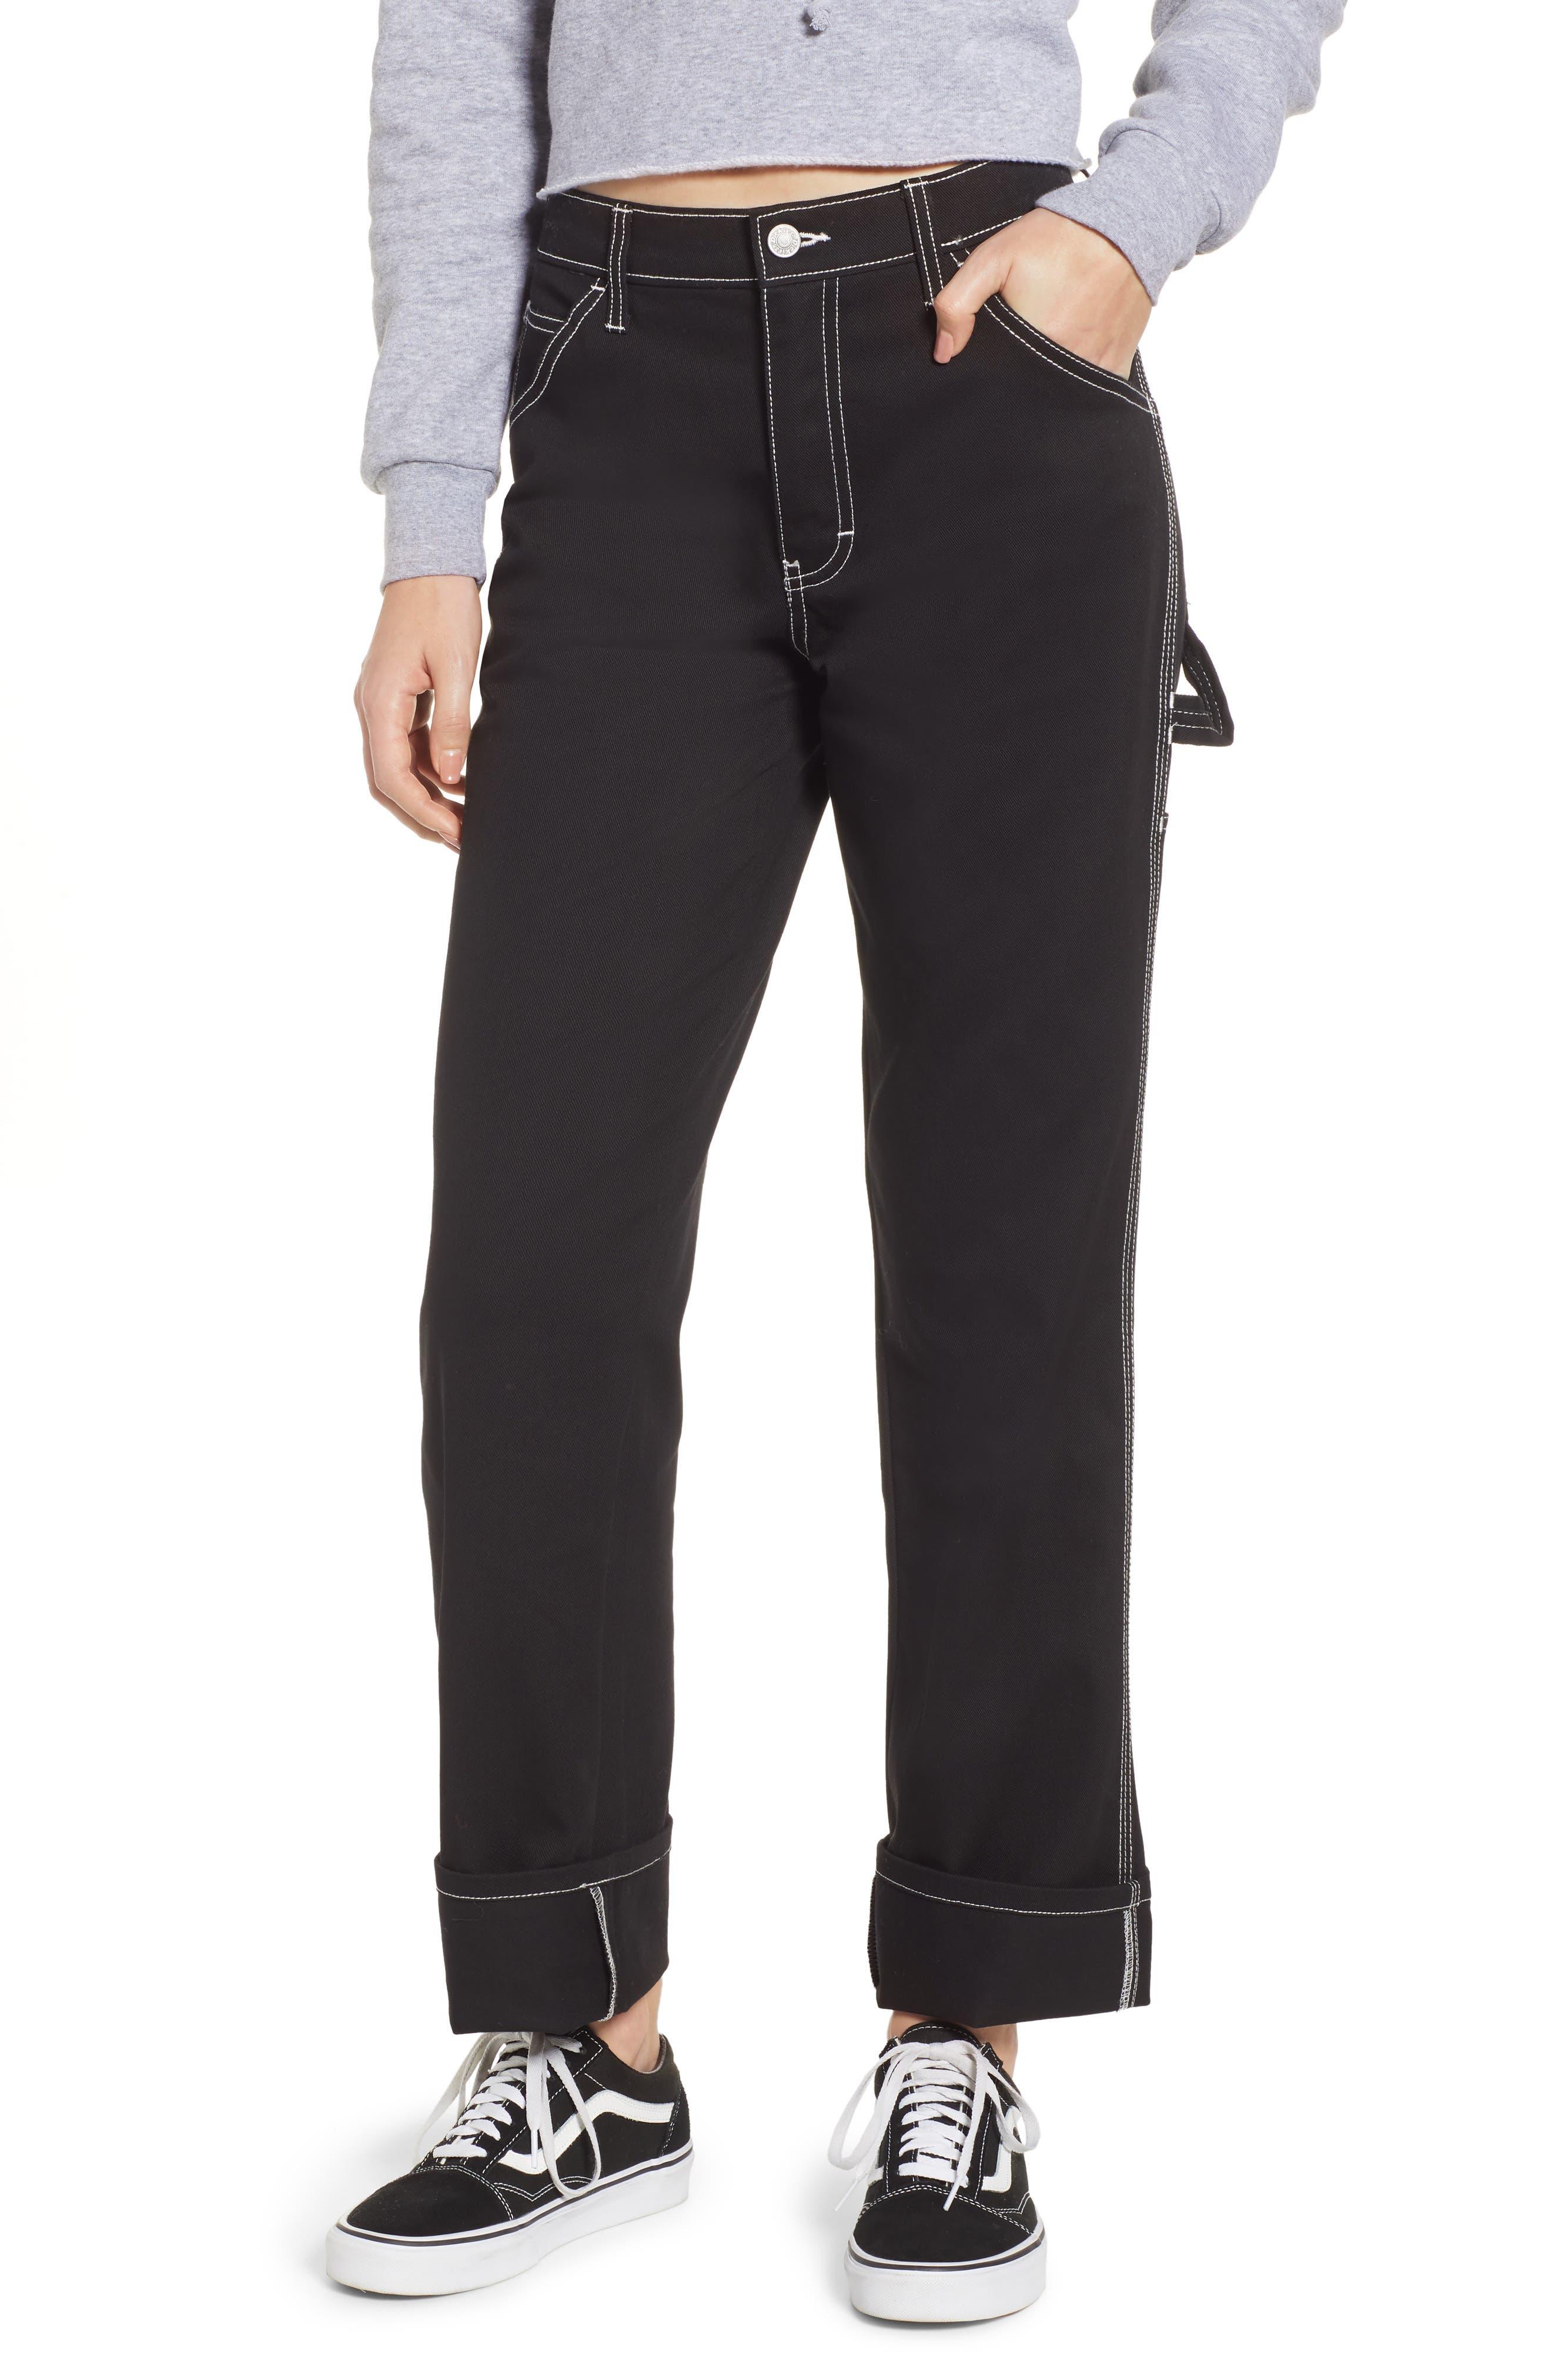 DICKIES, Relaxed Fit Carpenter Pants, Main thumbnail 1, color, BLACK